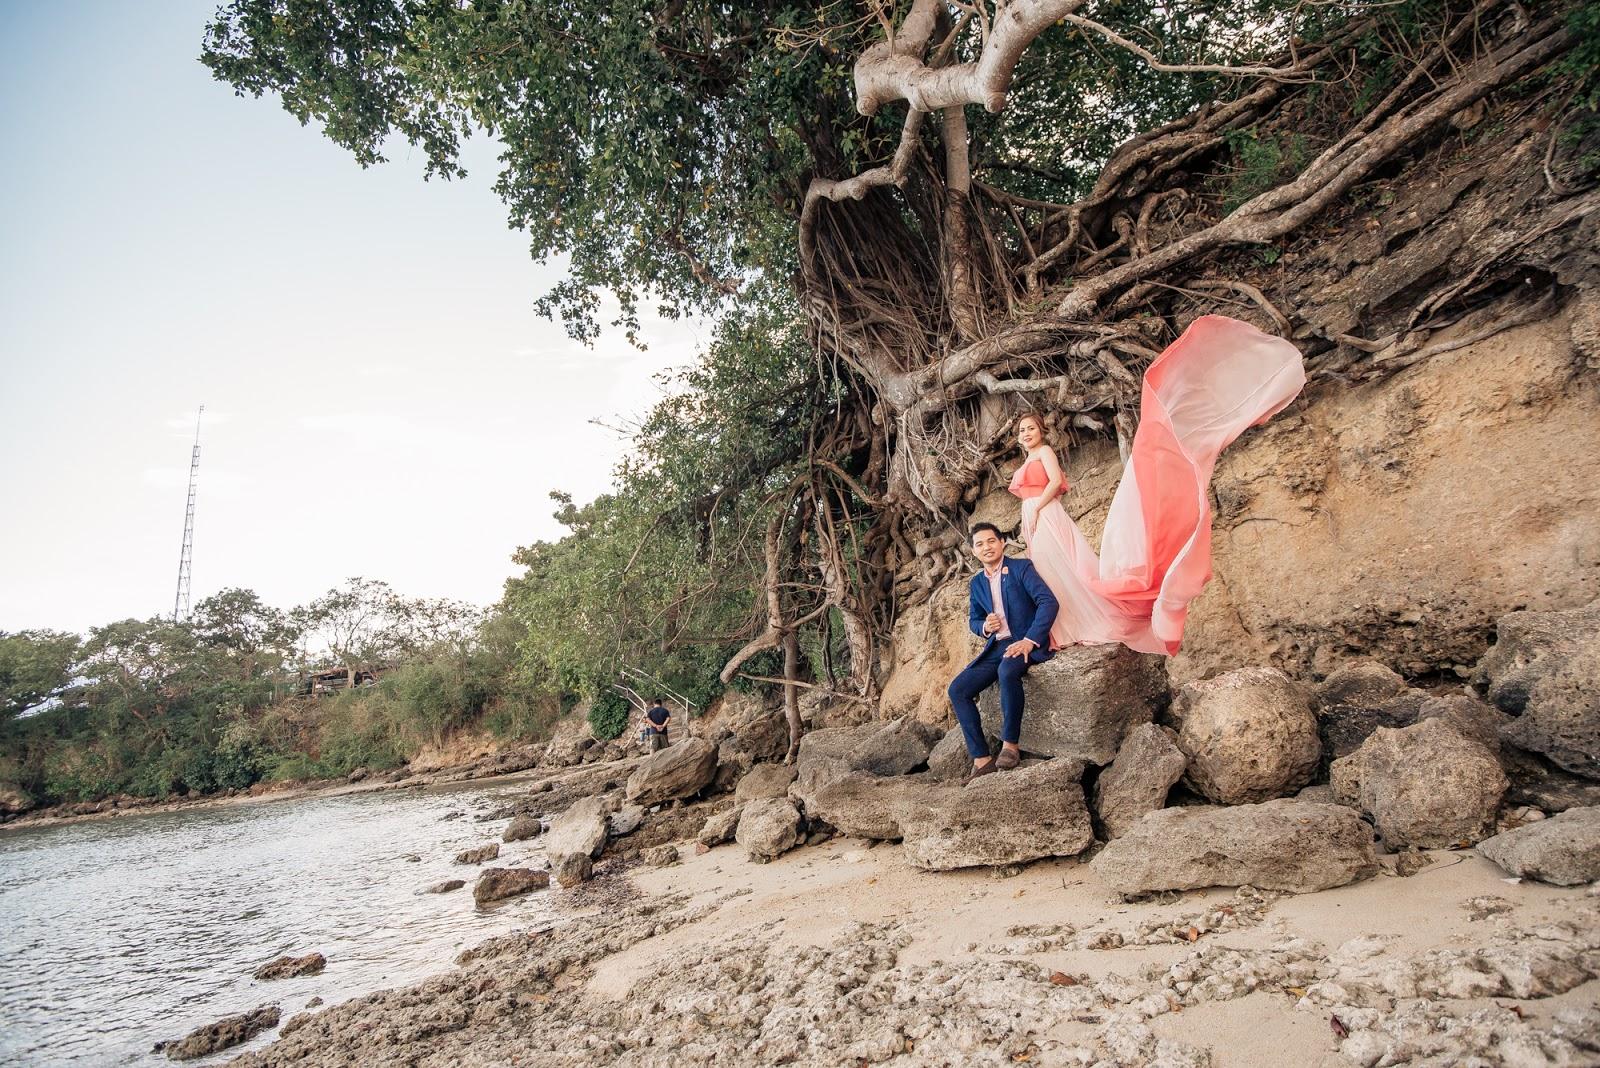 STILTS CALATAGAN BATANGAS DIY TRAVEL GUIDE